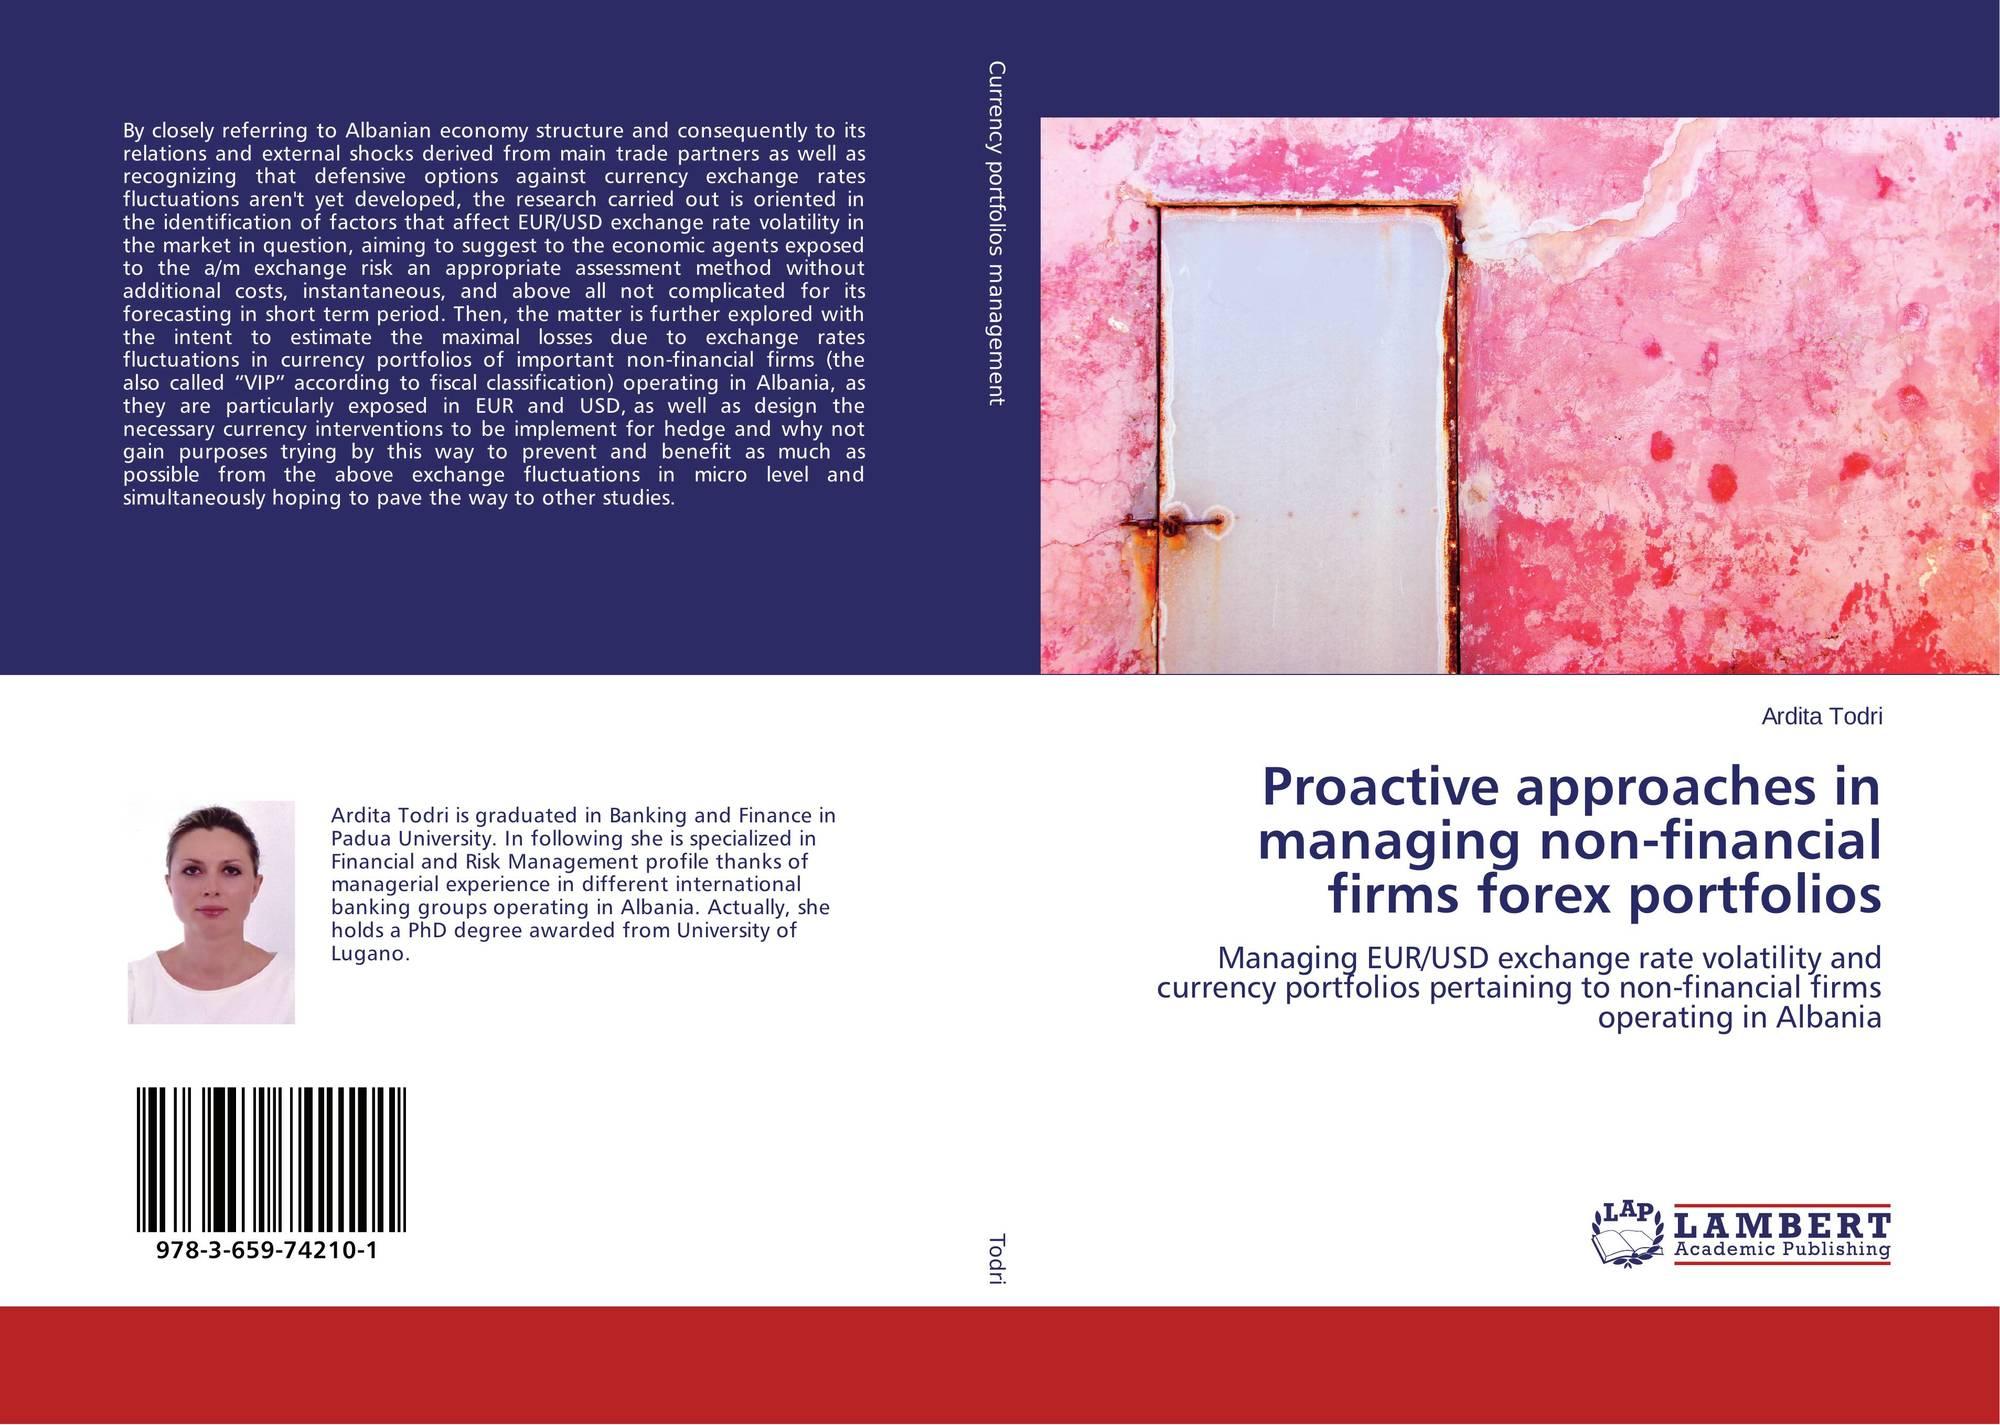 Forex portfolio management companies